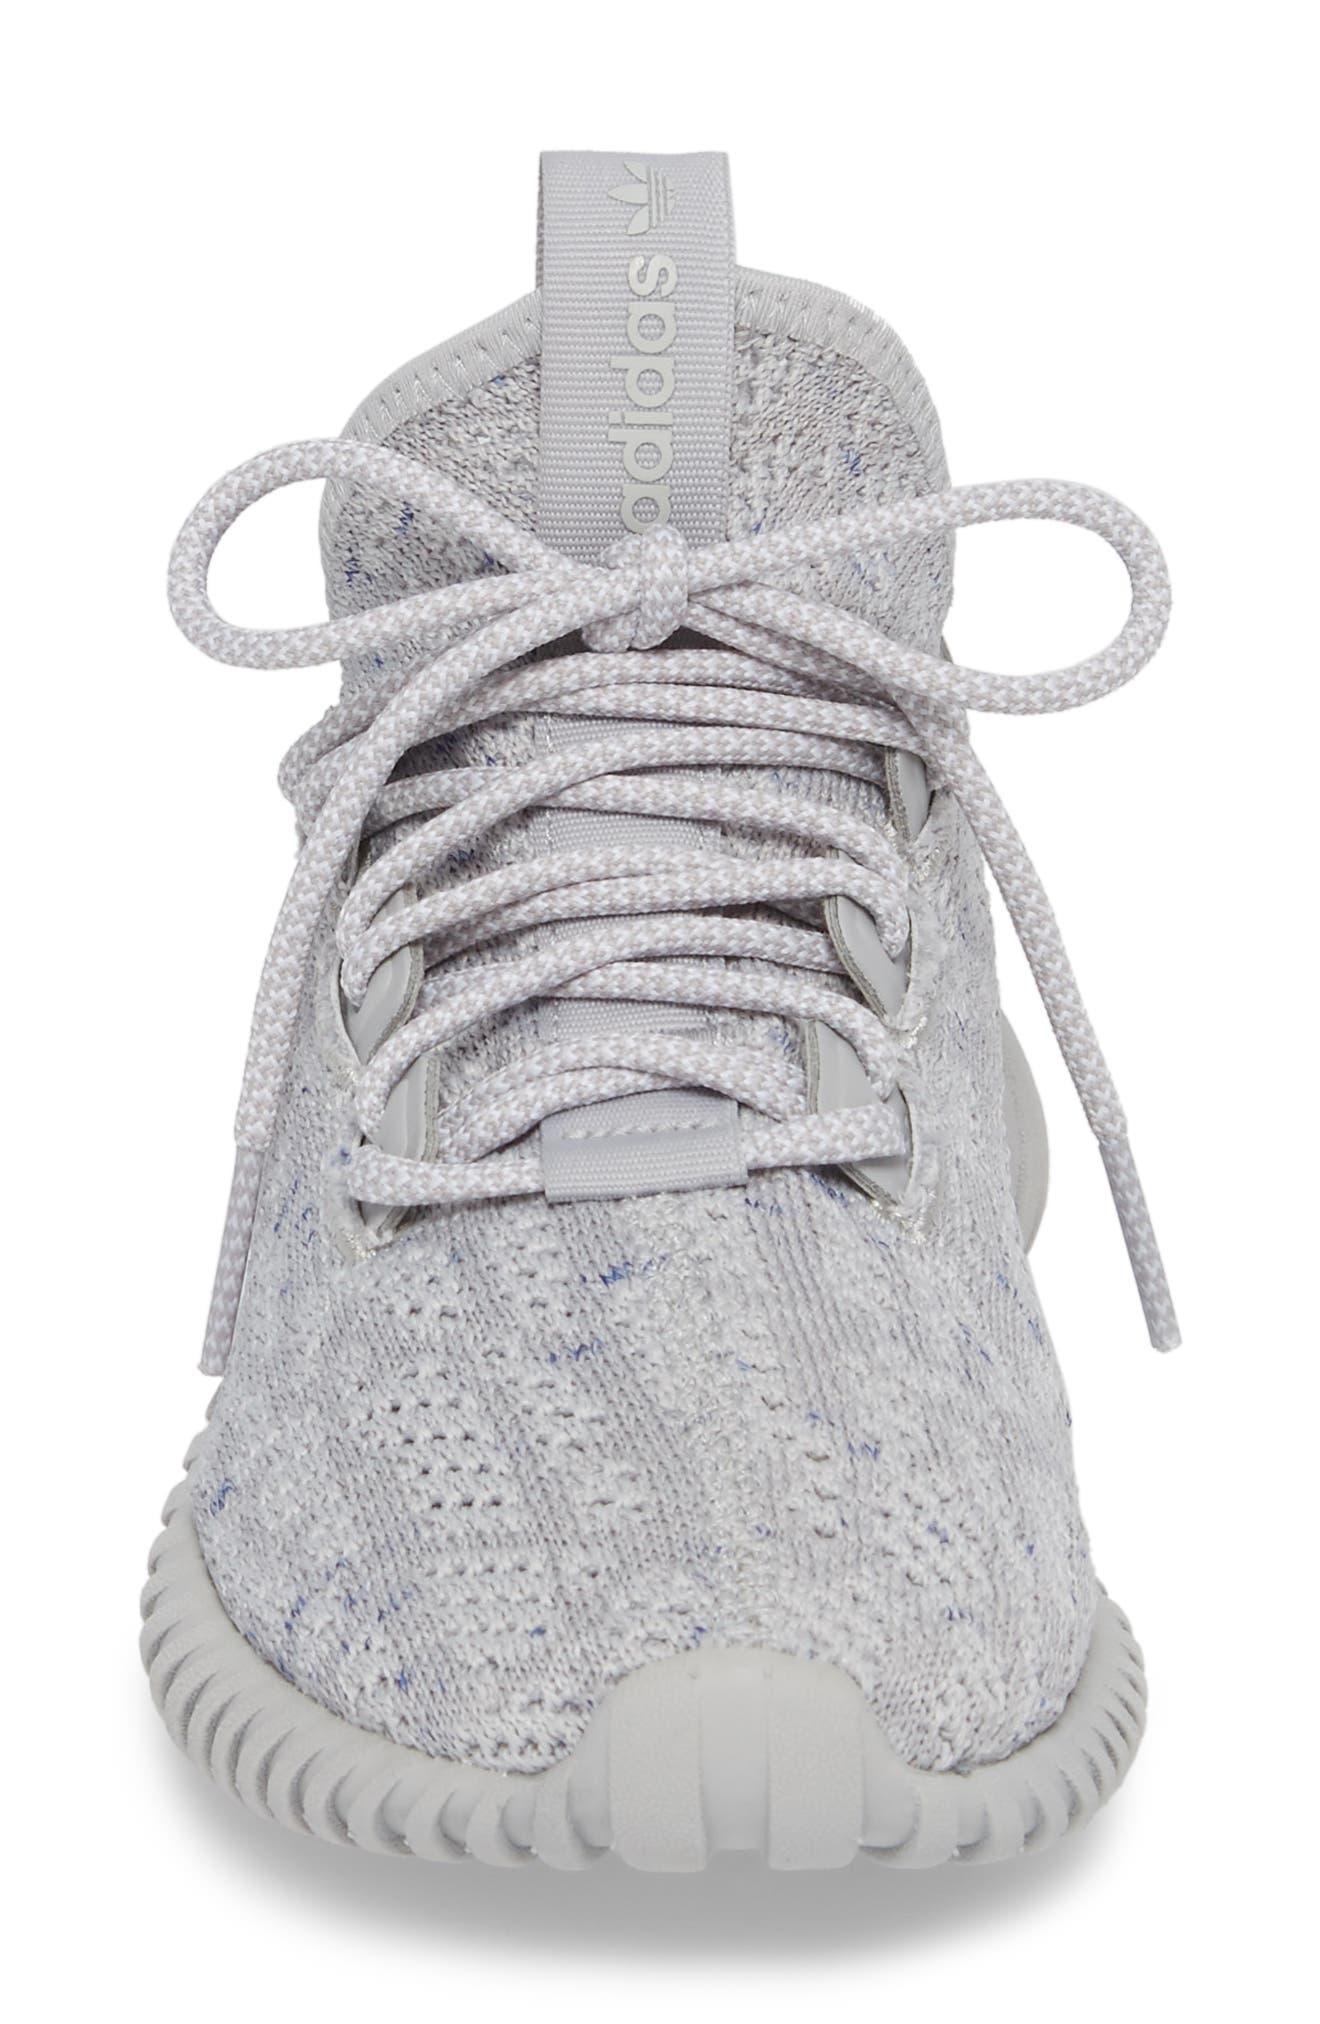 Tubular Doom Sock Primeknit Sneaker,                             Alternate thumbnail 4, color,                             Grey/ White/ Blue